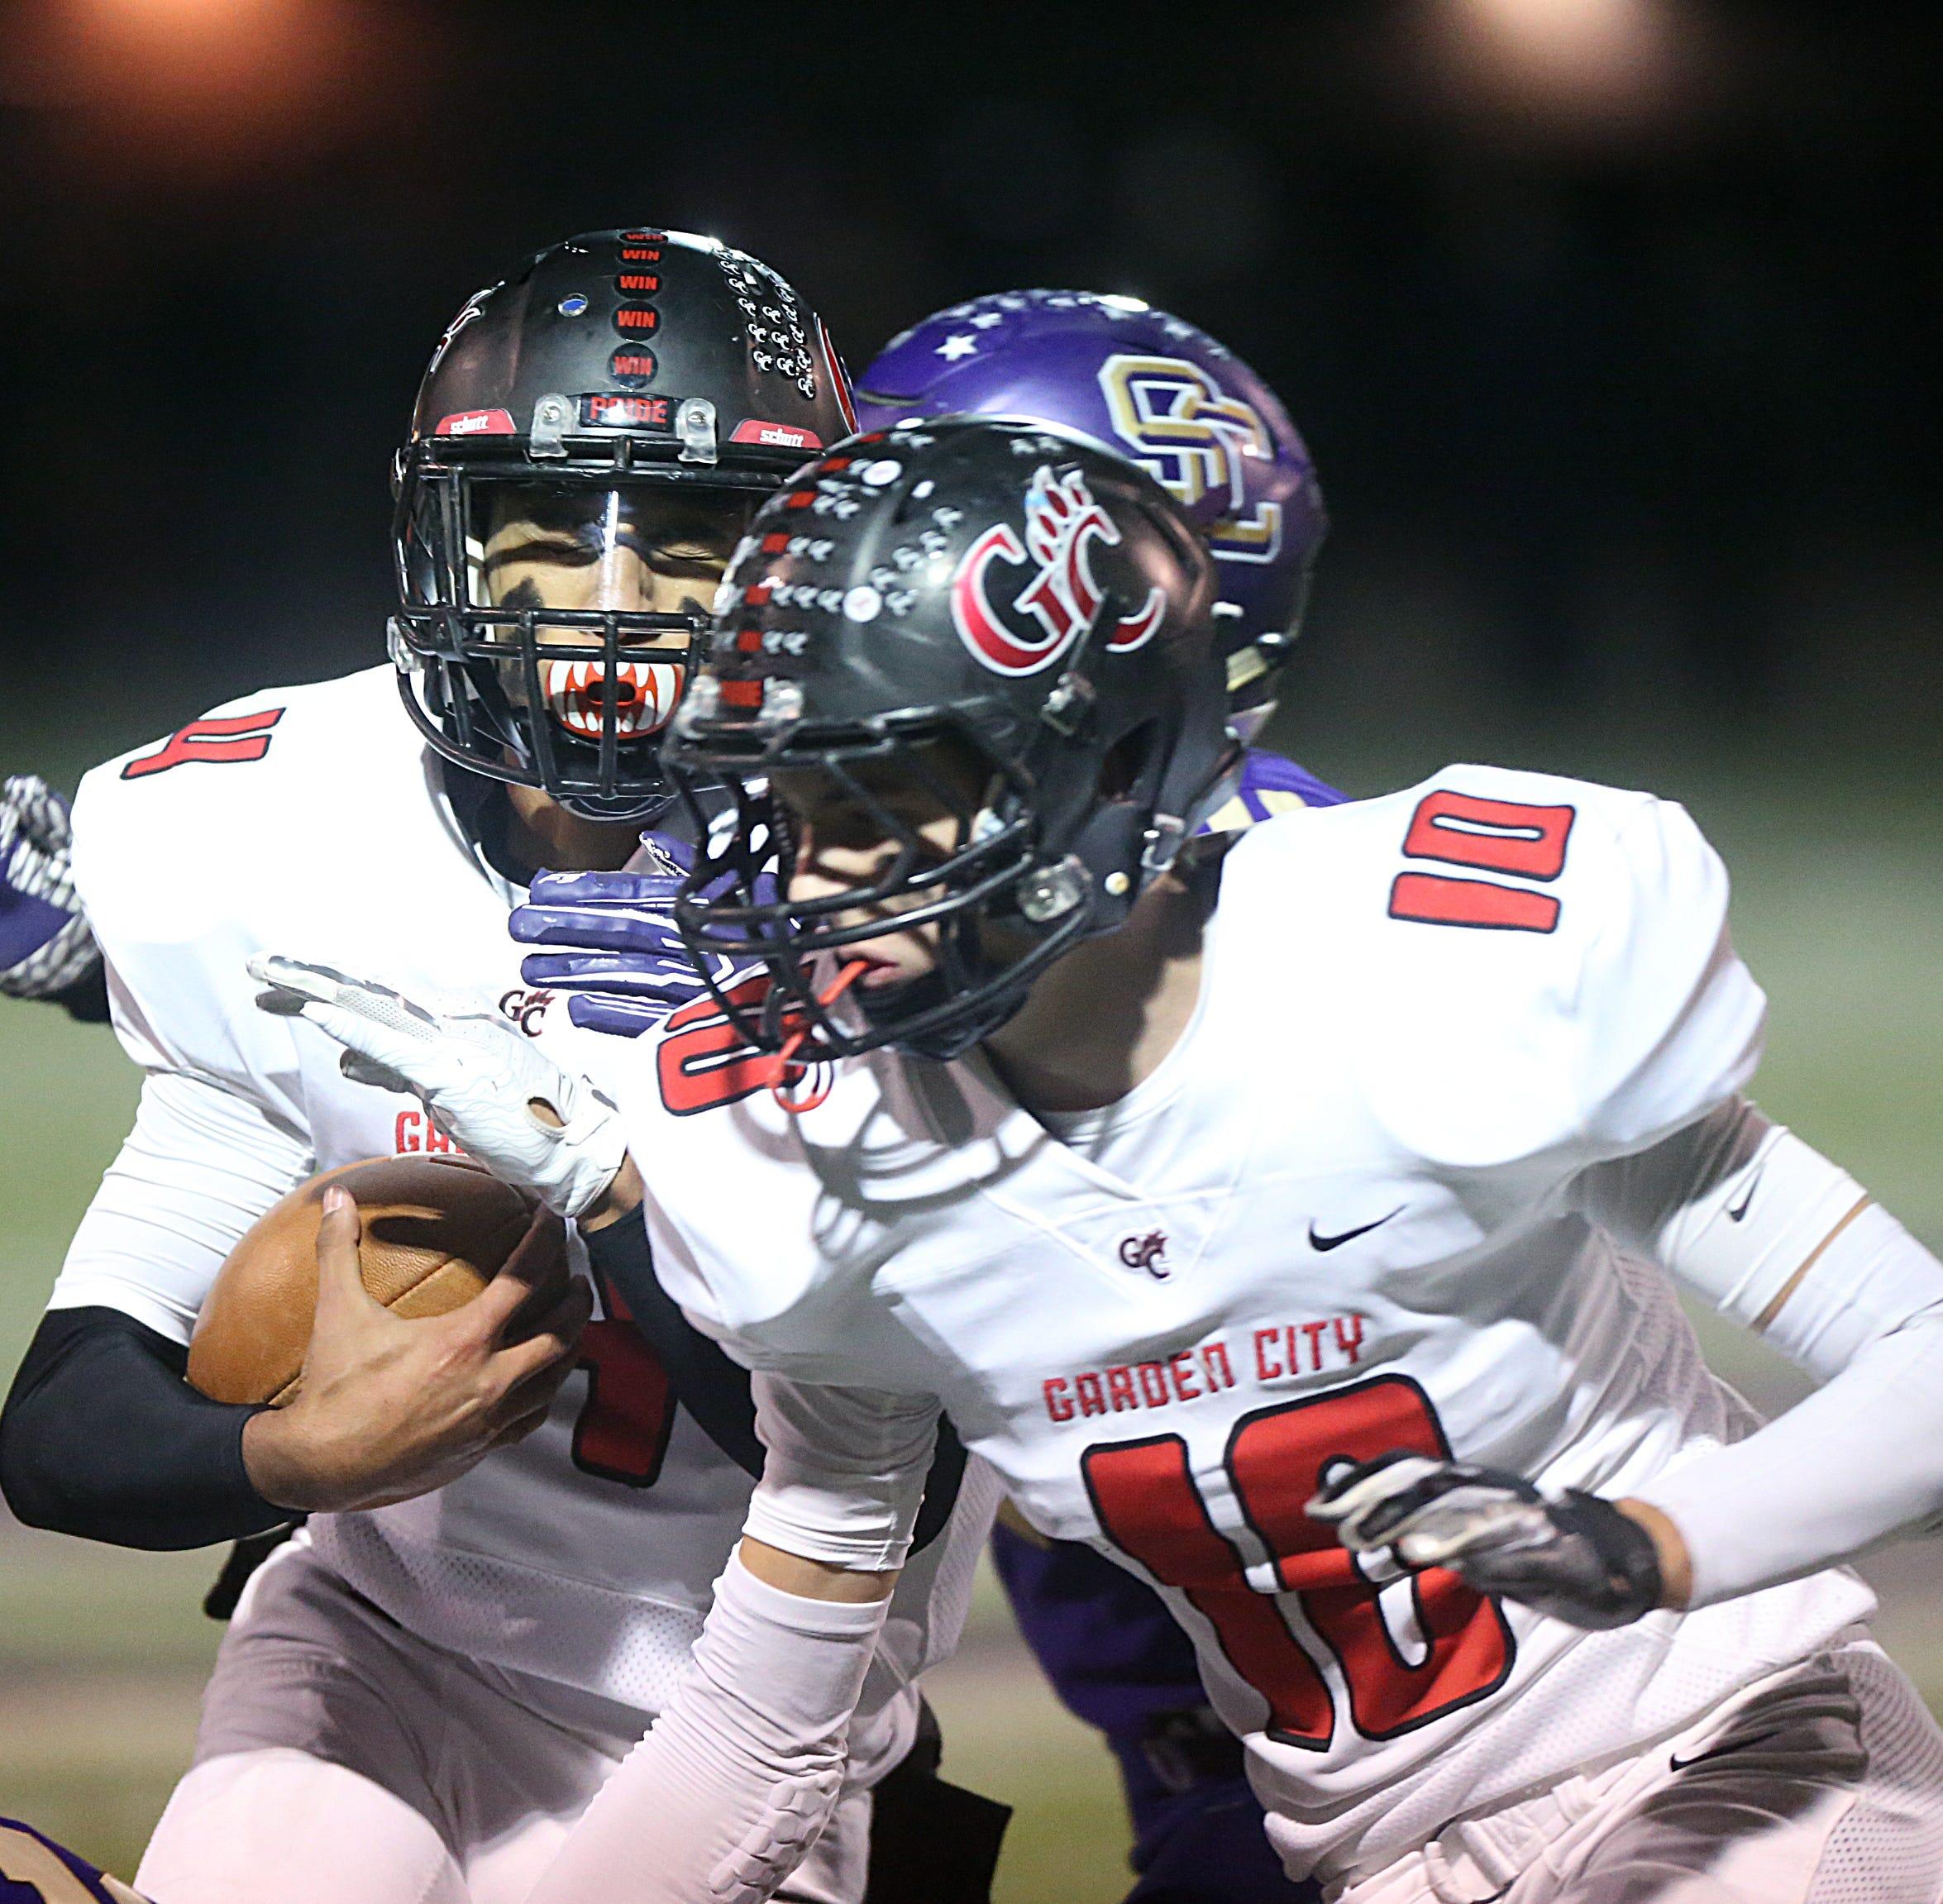 UPDATED: Texas High School Football State Quarterfinals, Playoff Pairings